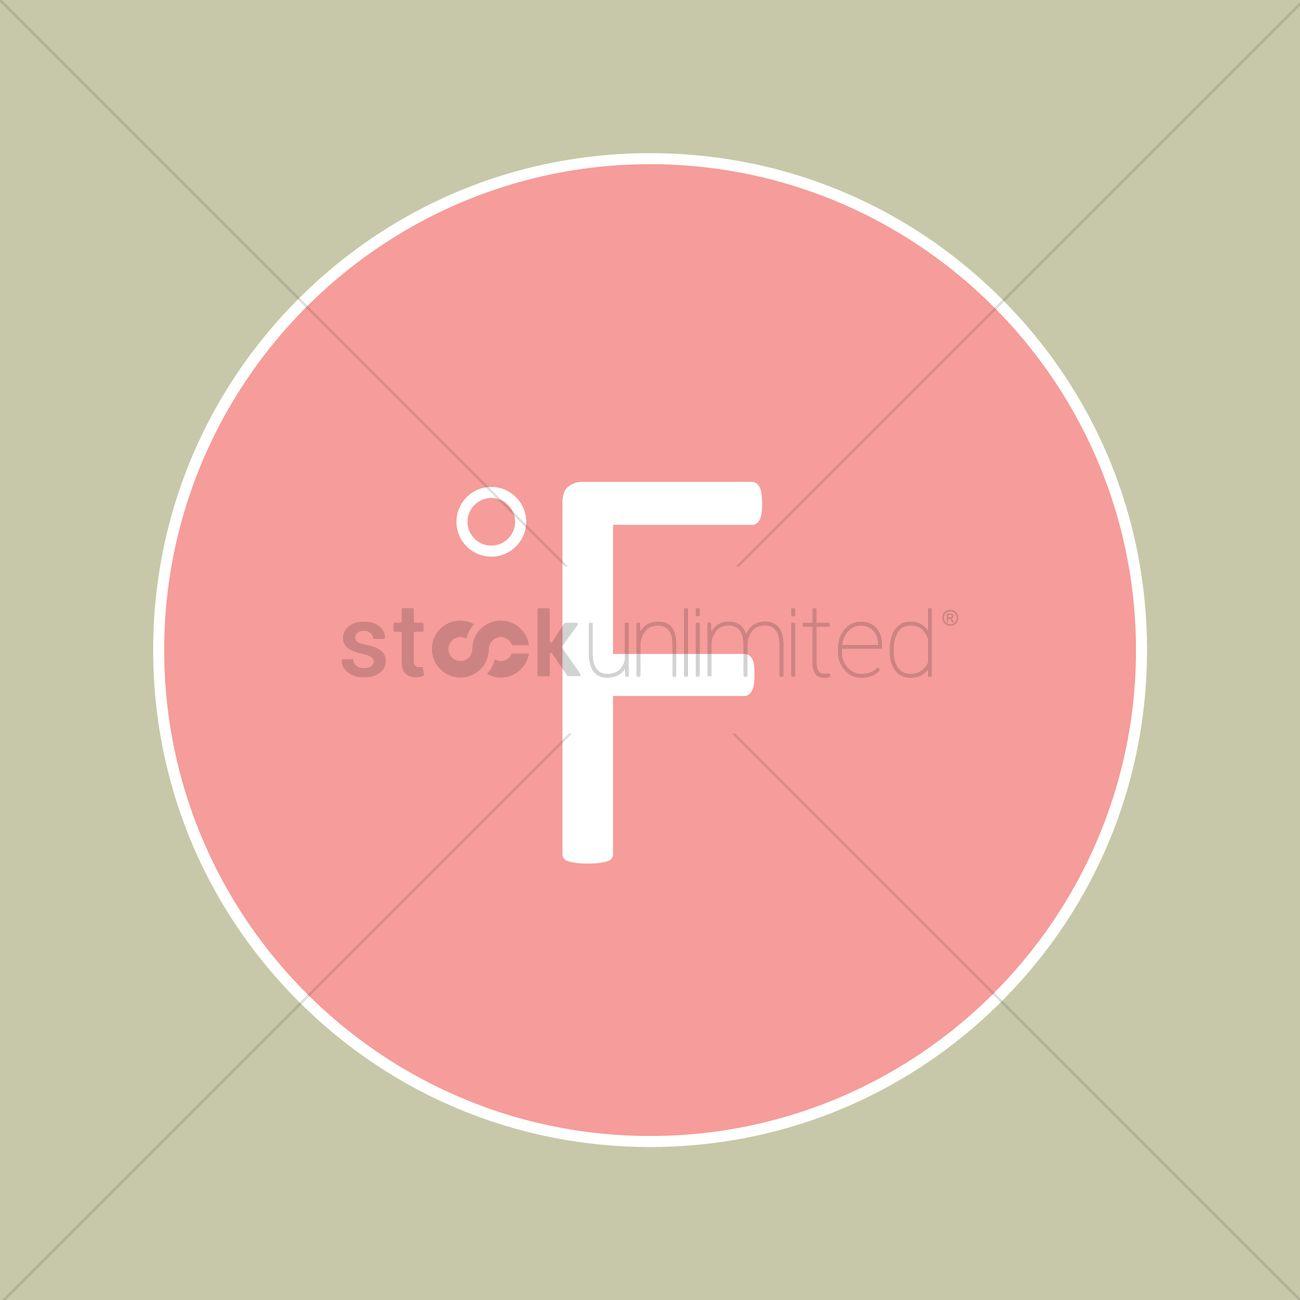 Fahrenheit symbol icon vector image 1334969 stockunlimited fahrenheit symbol icon vector graphic biocorpaavc Choice Image